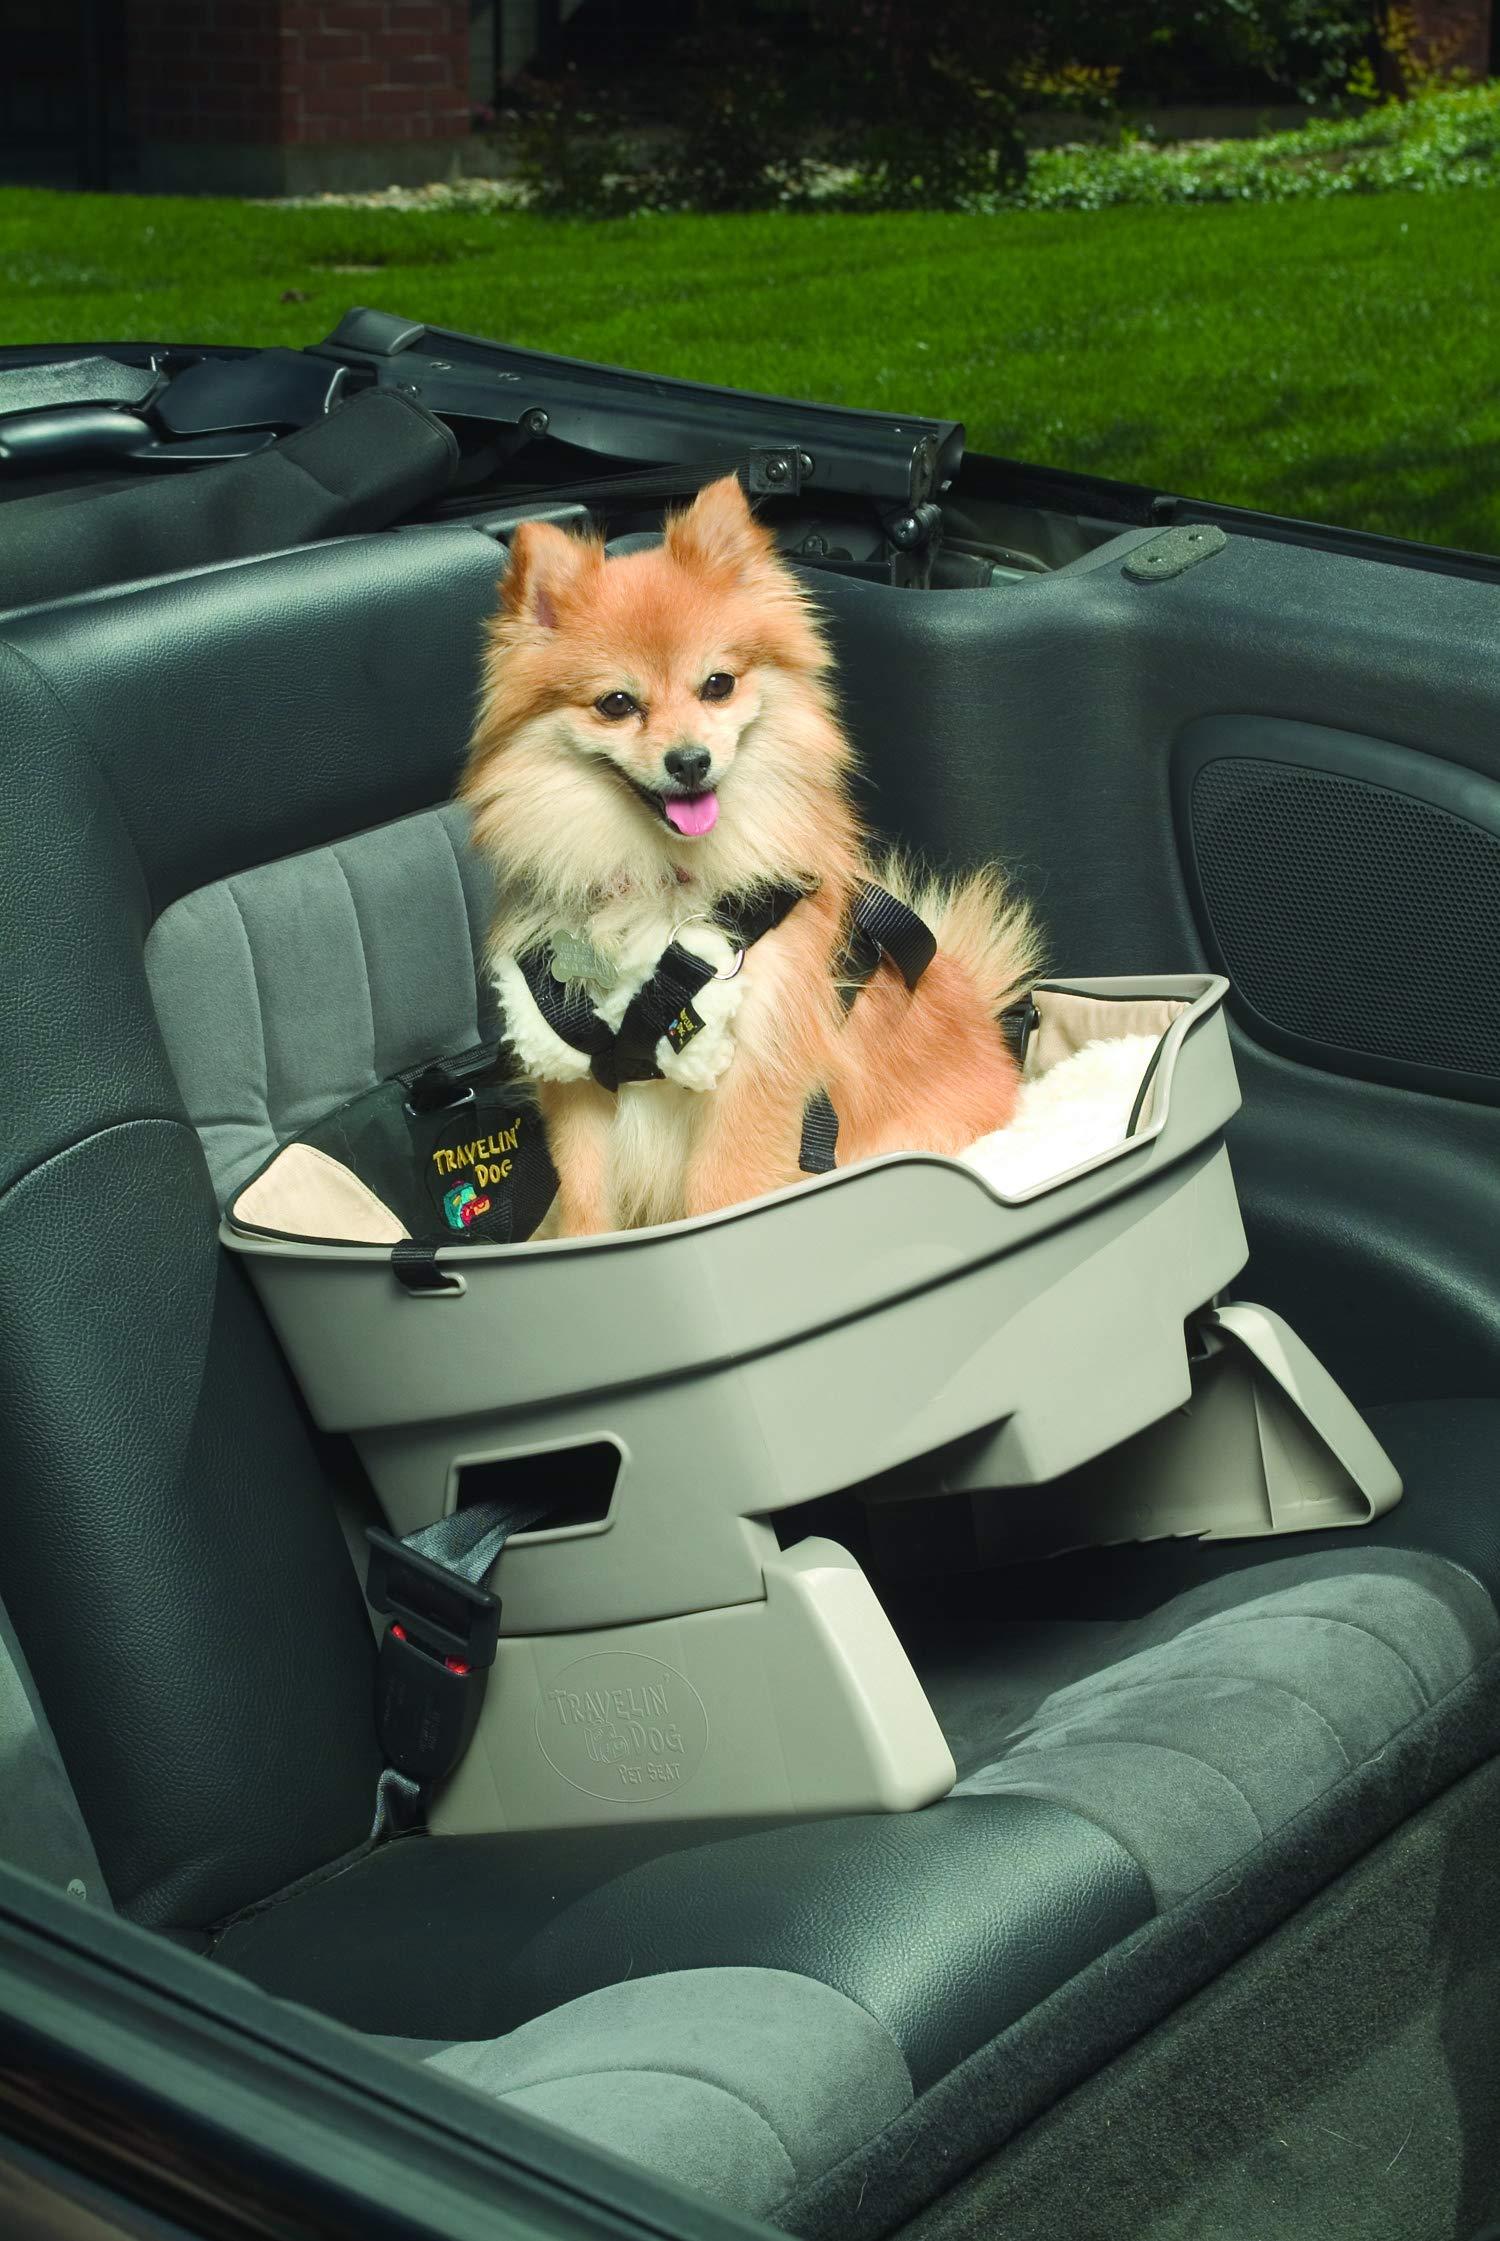 Good Pet Stuff Travelin' Dog Pet Seat by Good Pet Stuff